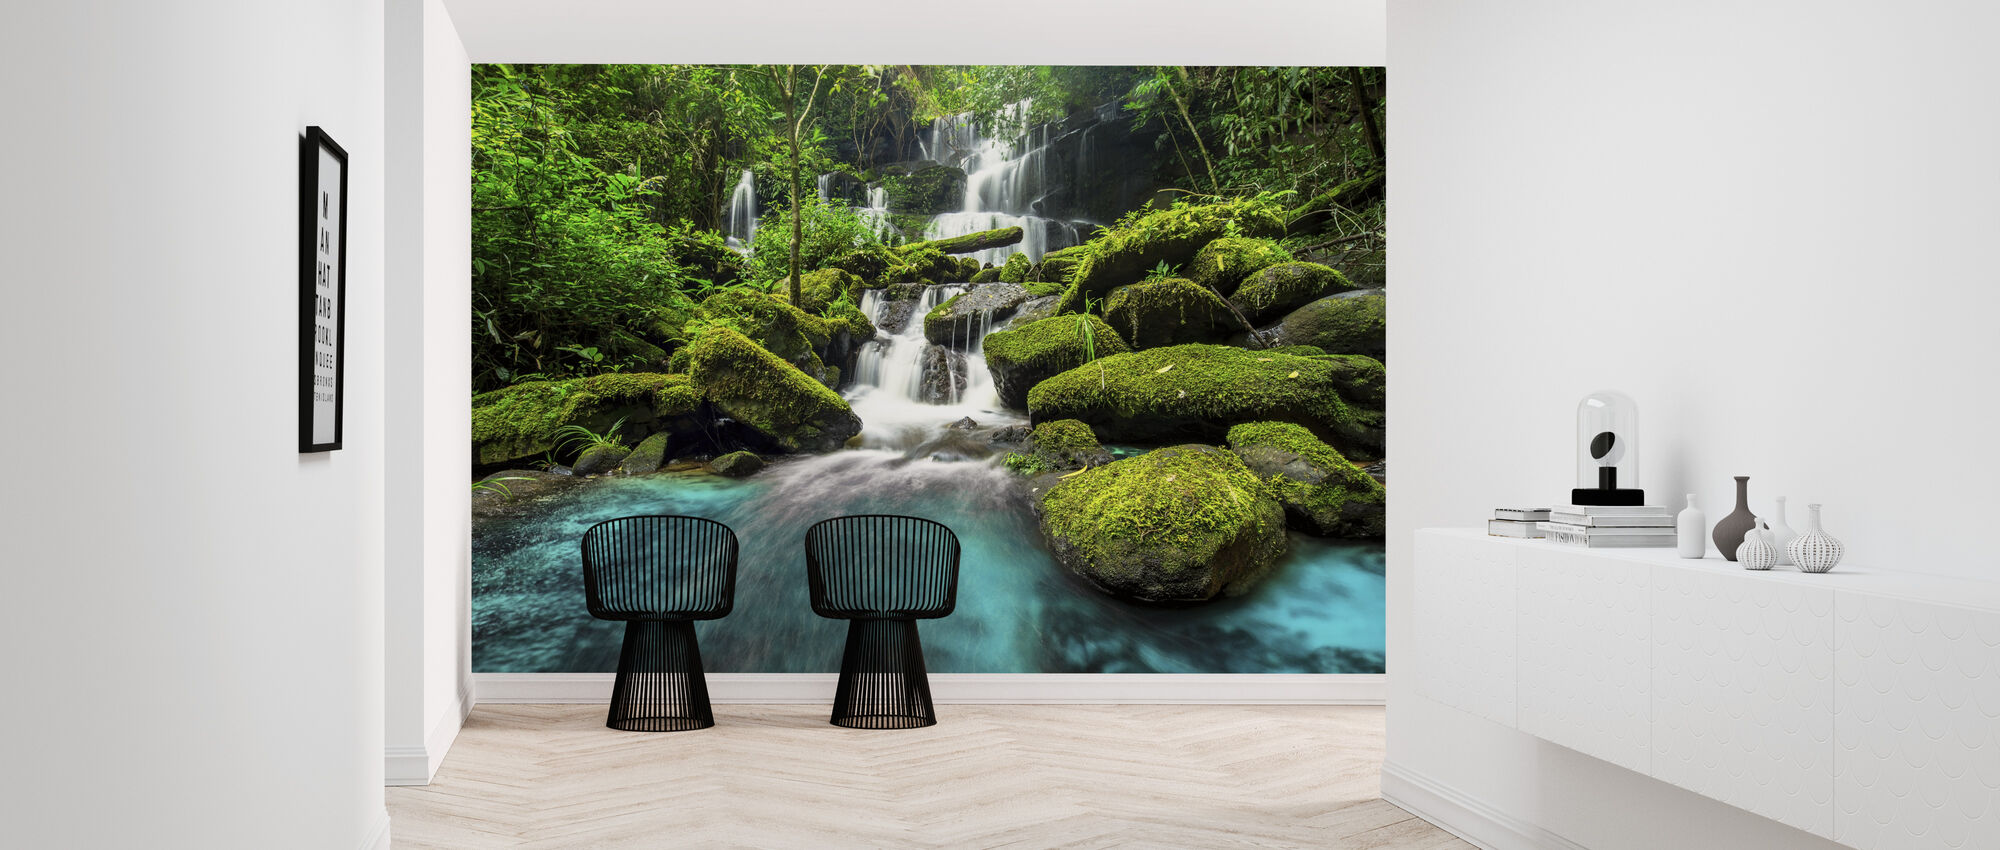 Green Forest Waterfall - Wallpaper - Hallway